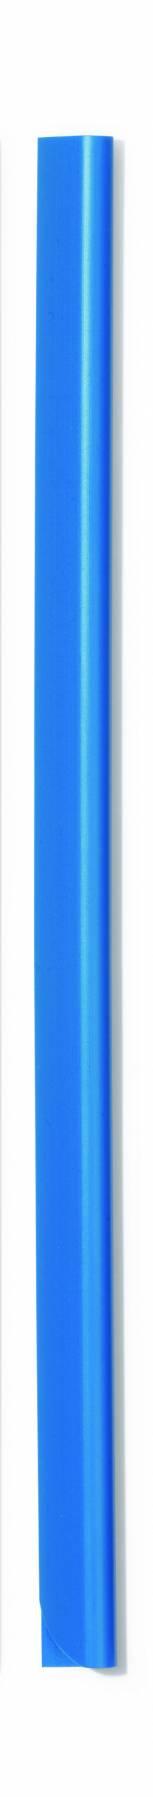 DB290106